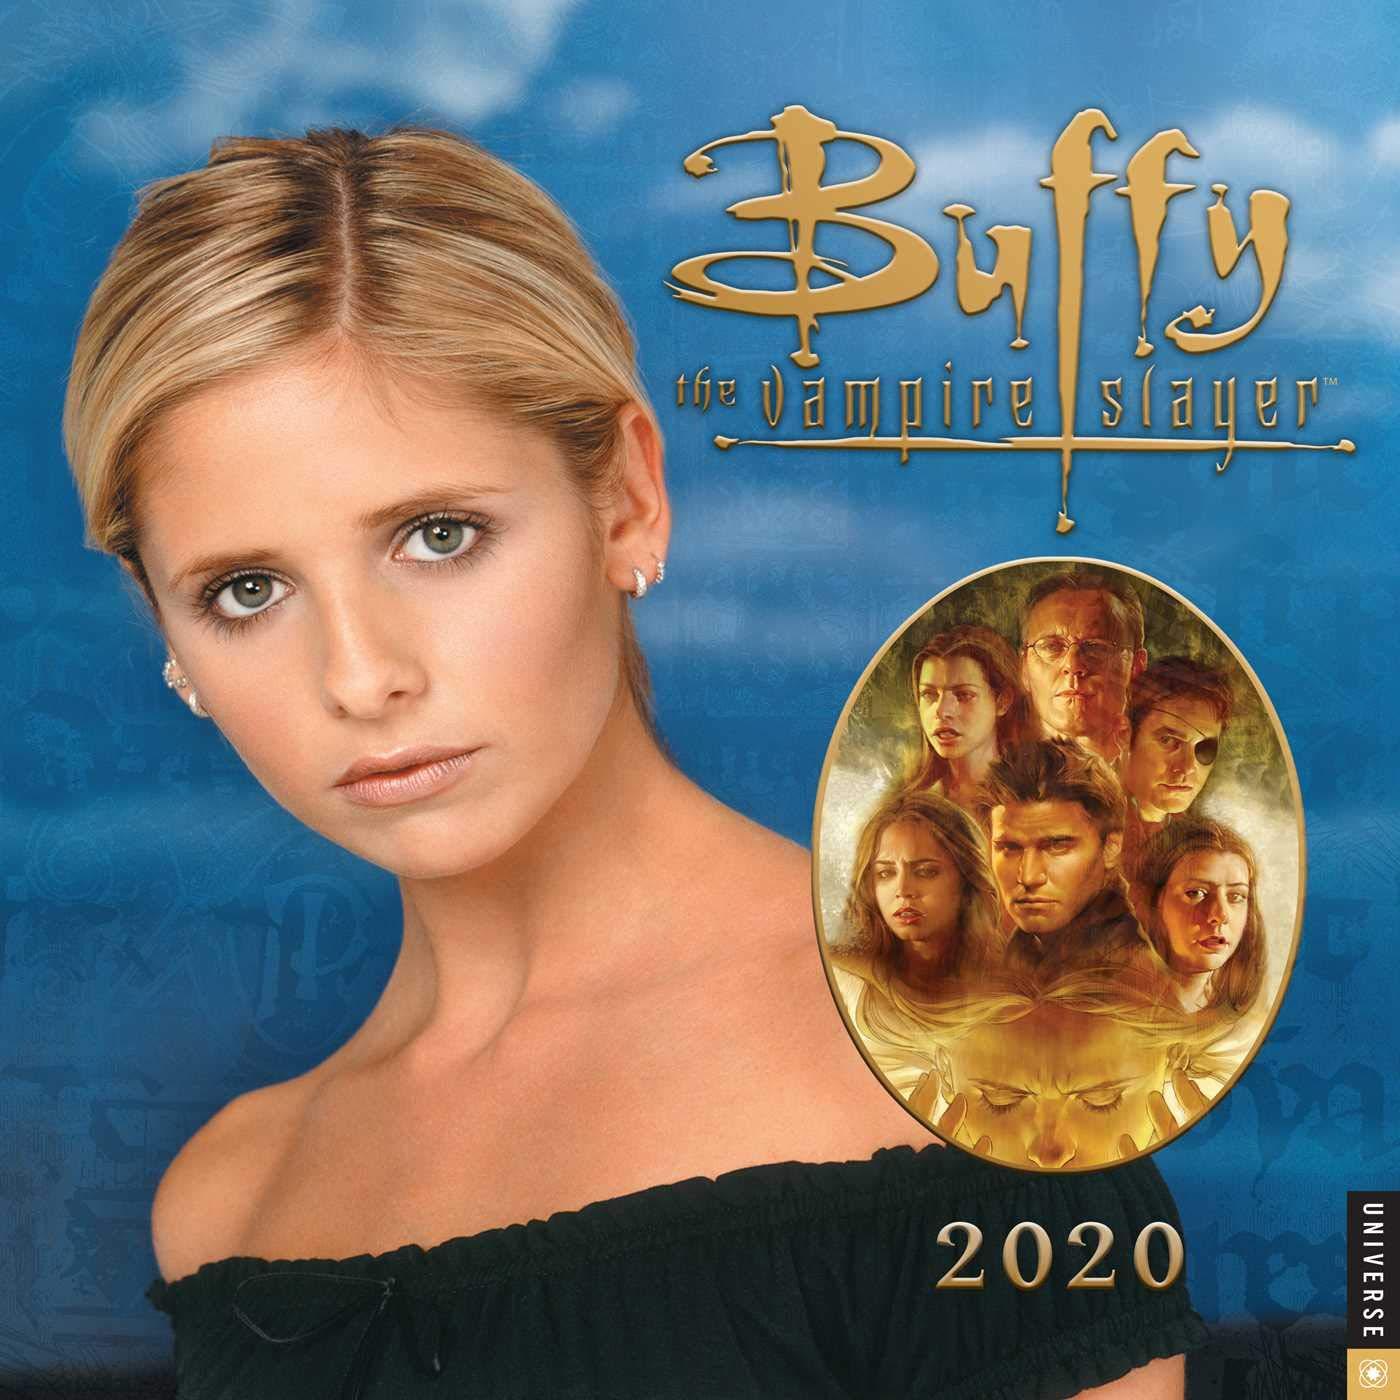 Buffy the Vampire Slayer 2020 Wall Calendar by Universe Publishing